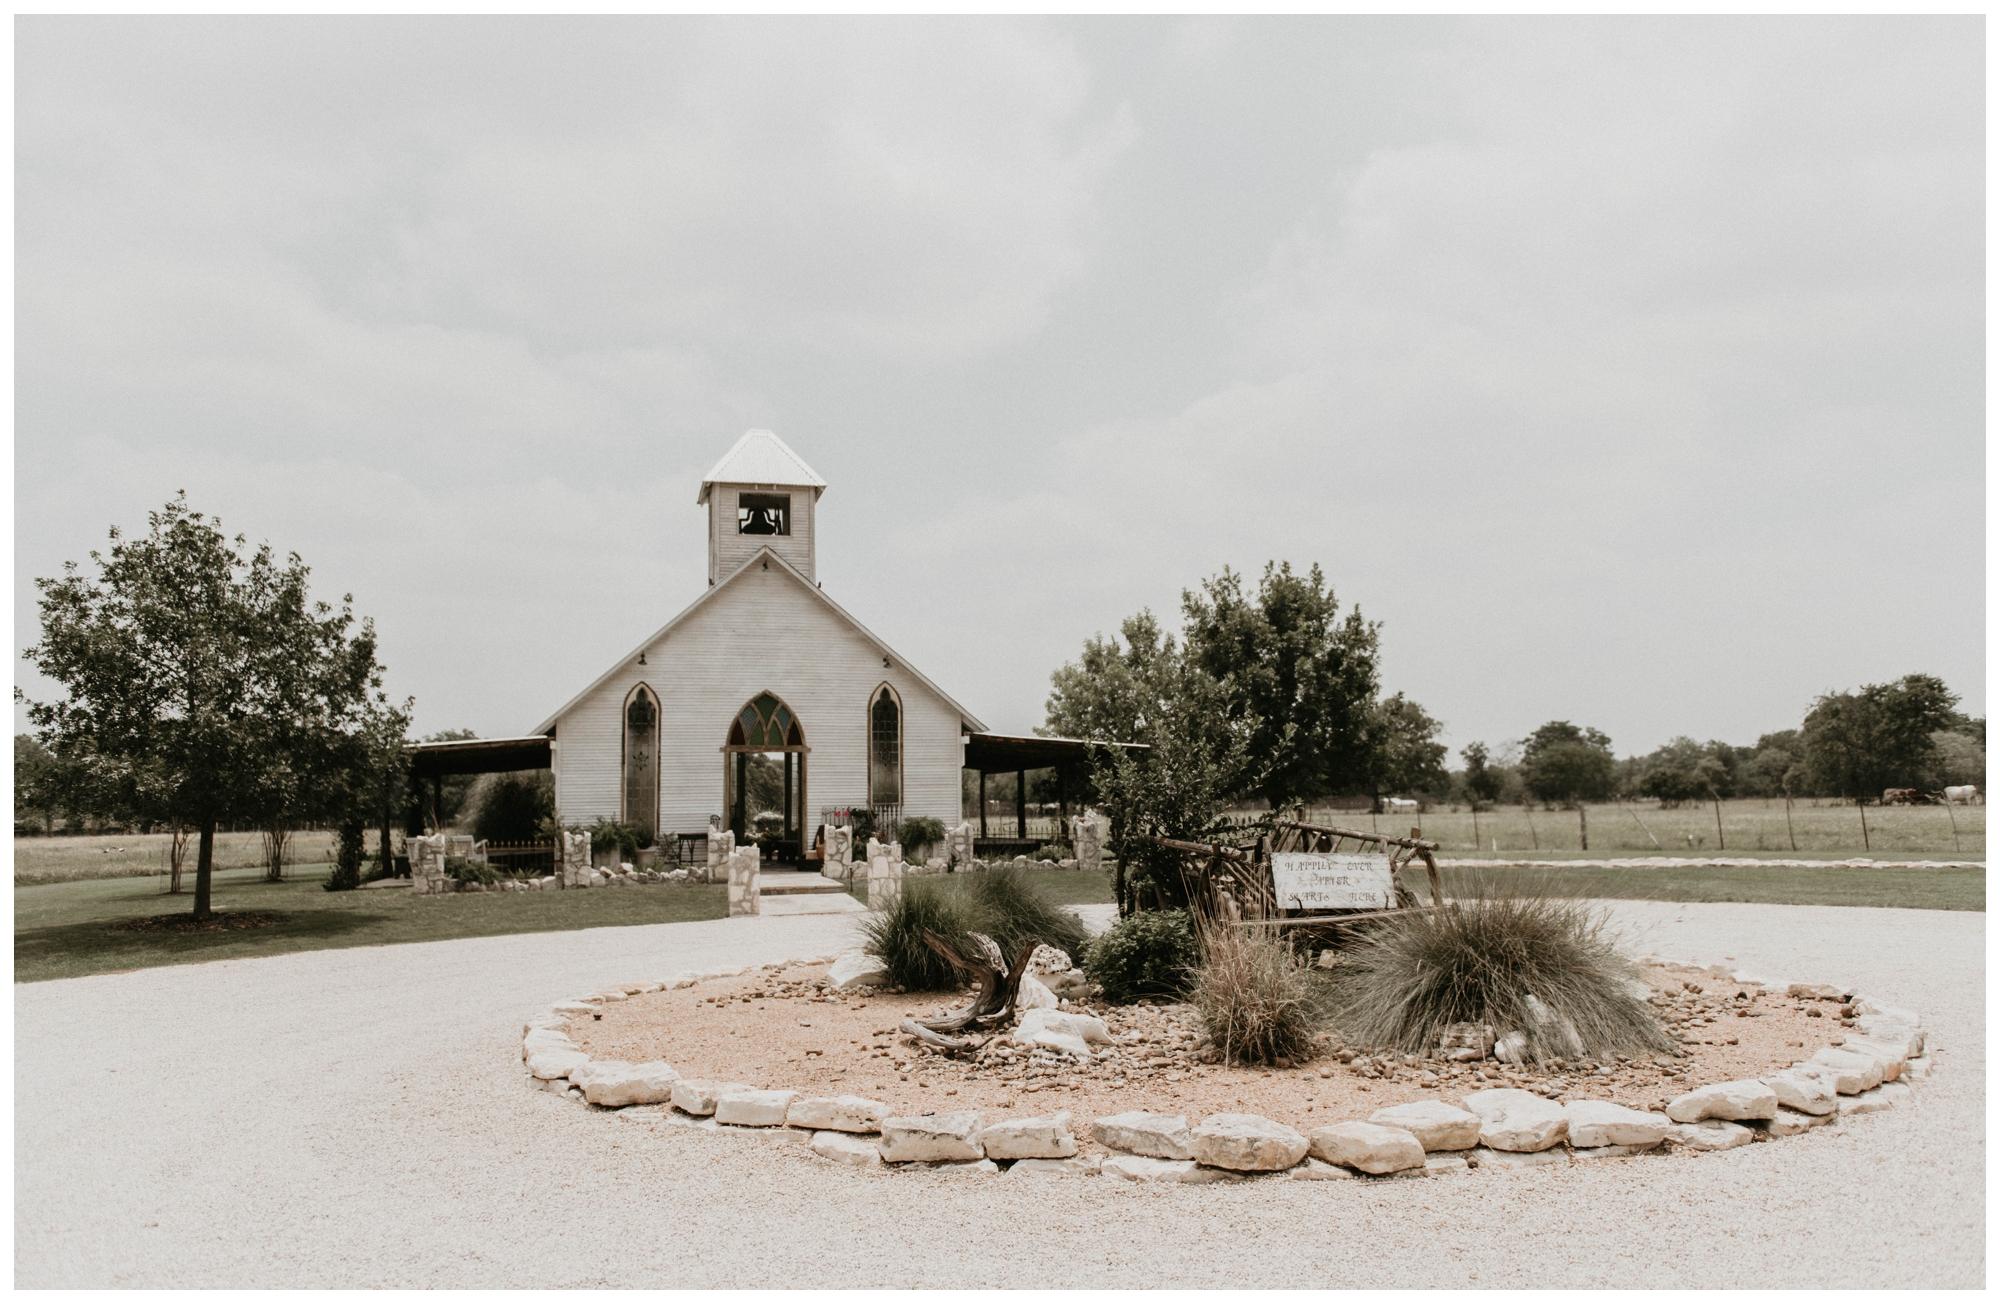 austin-texas-wedding-photography-1778-photographie_0001.jpg